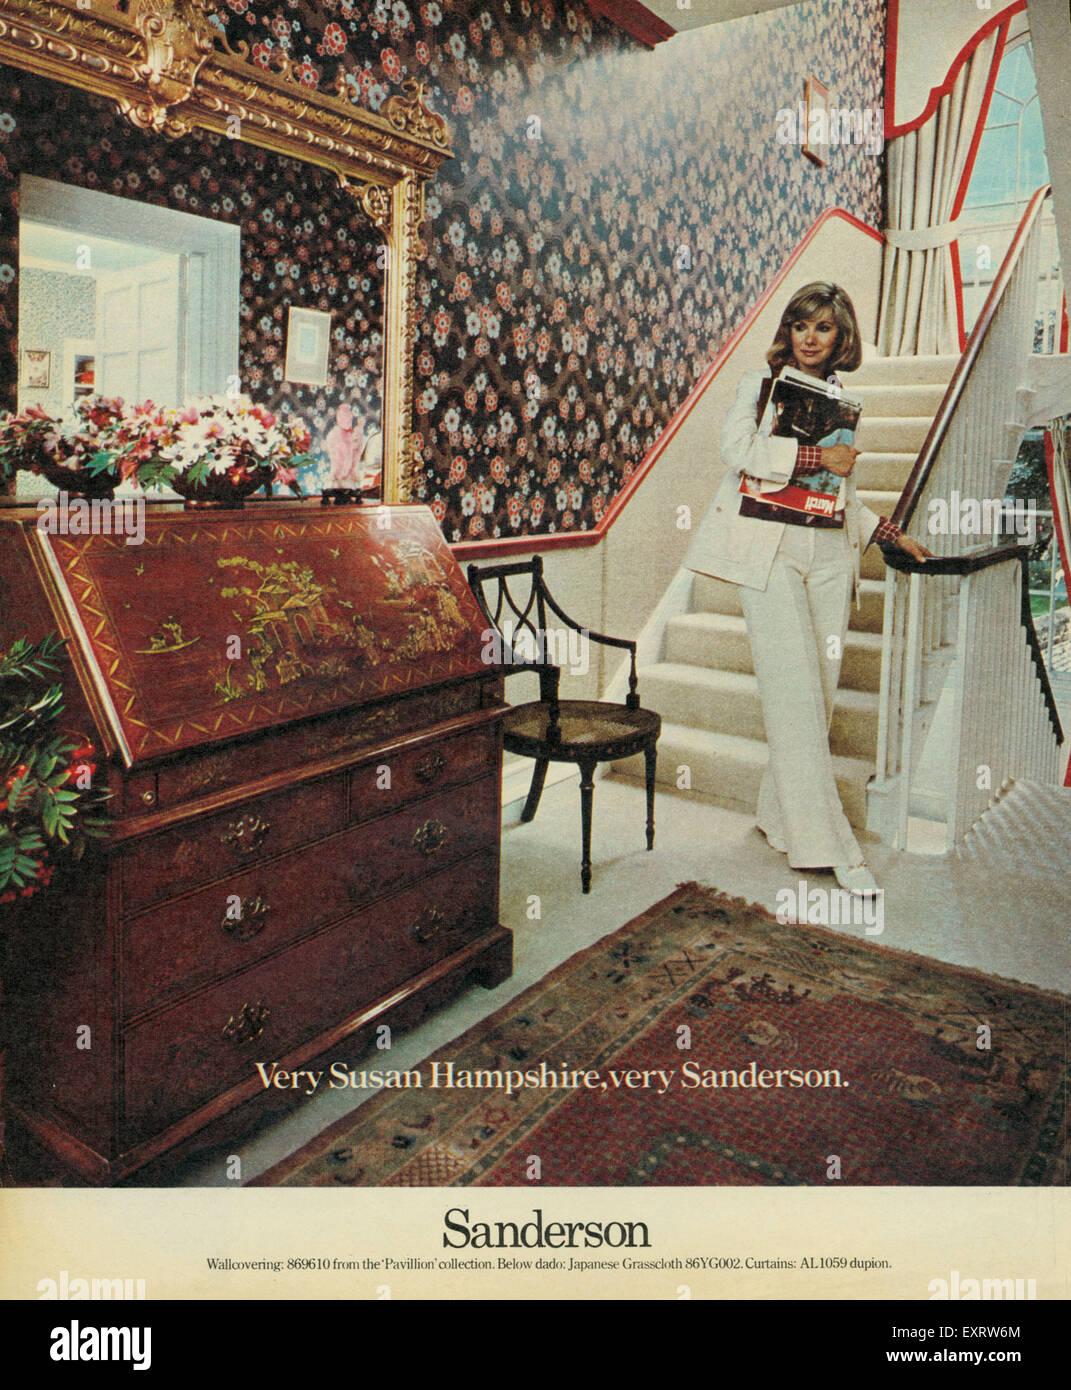 1970s Uk Sanderson Magazine Advert Stock Photos & 1970s Uk ...